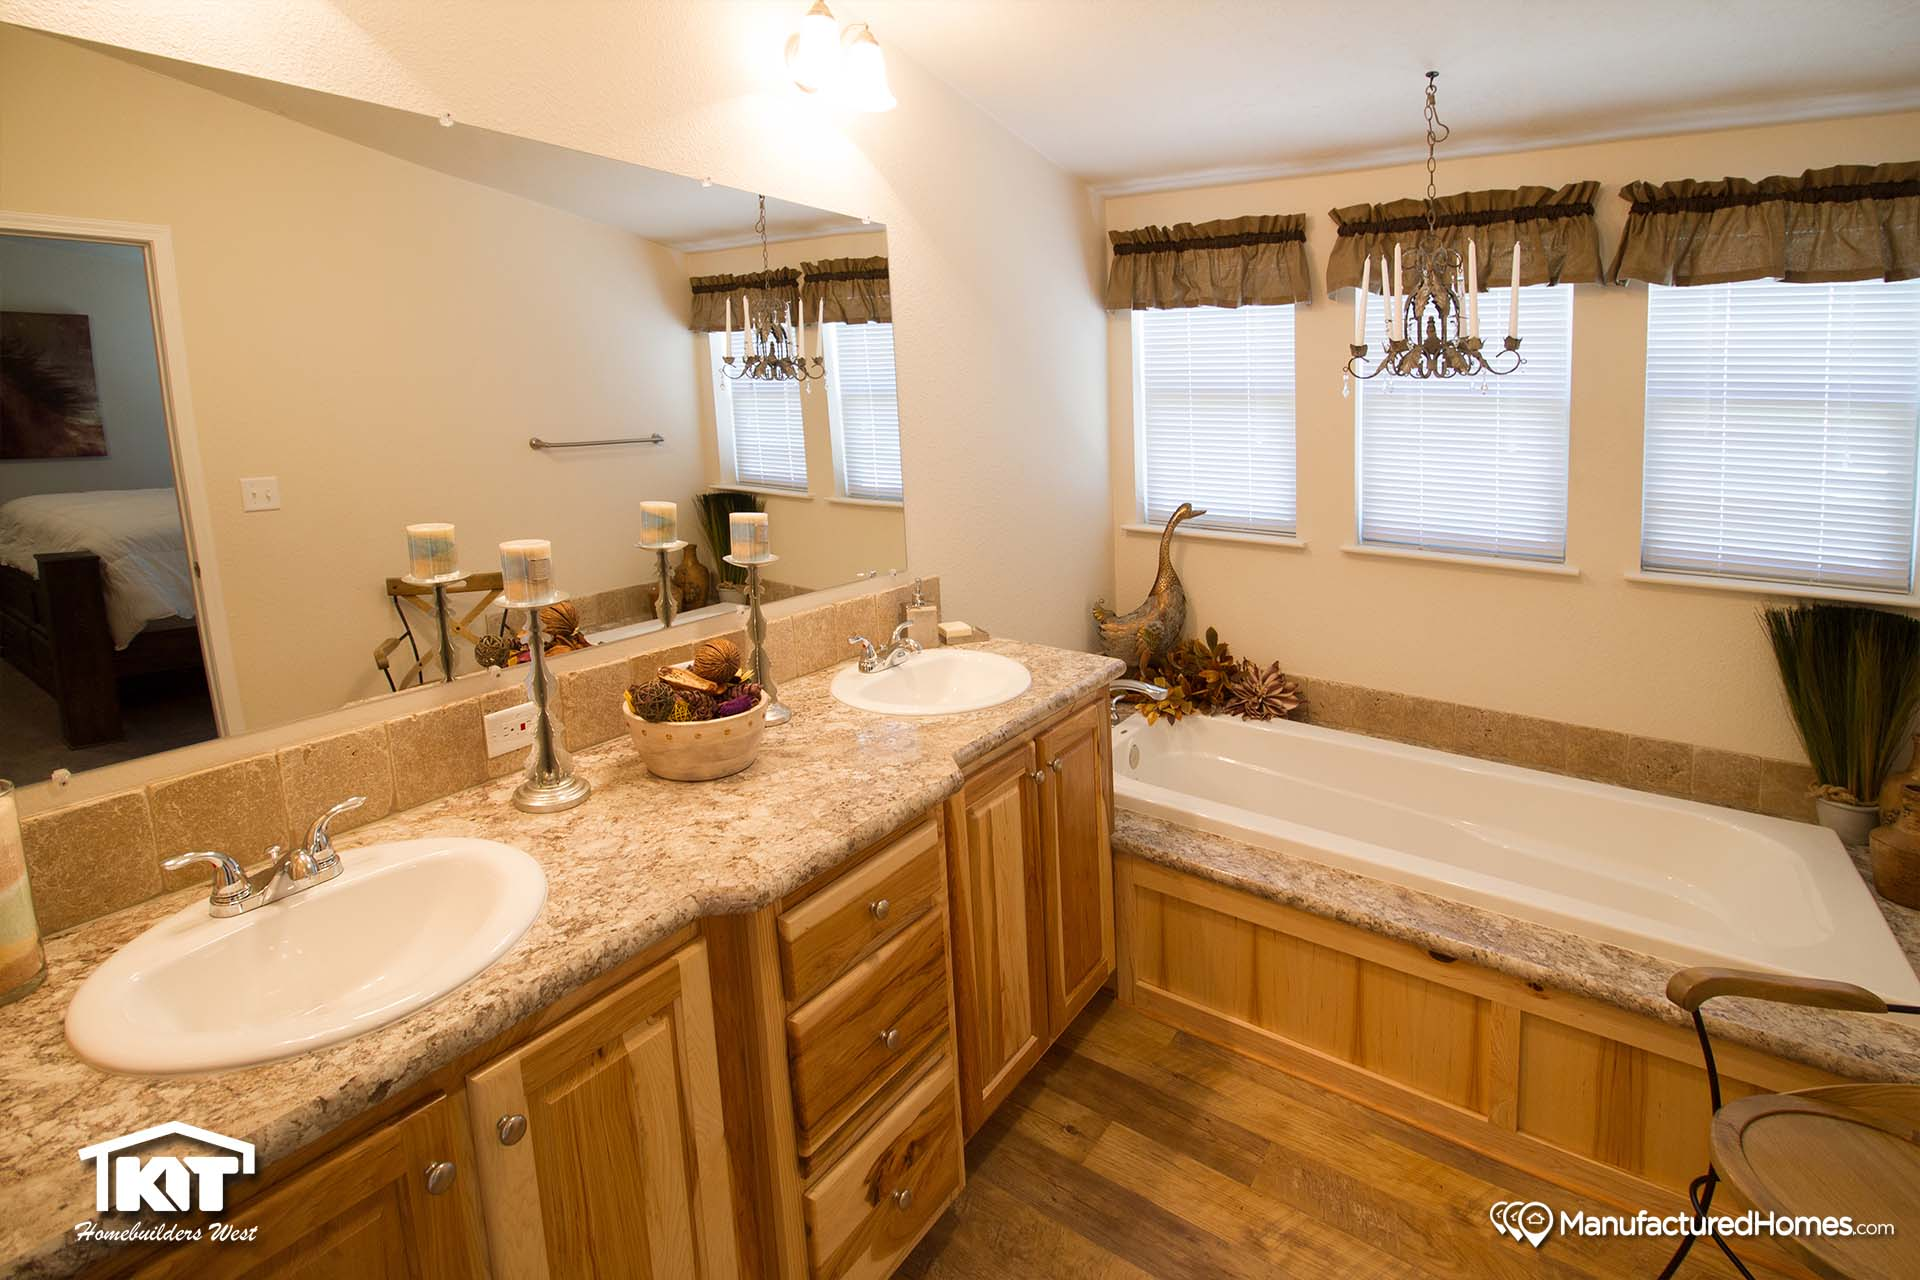 KIT Custom Homebuilders of Caldwell, Idaho - Manufactured and ...